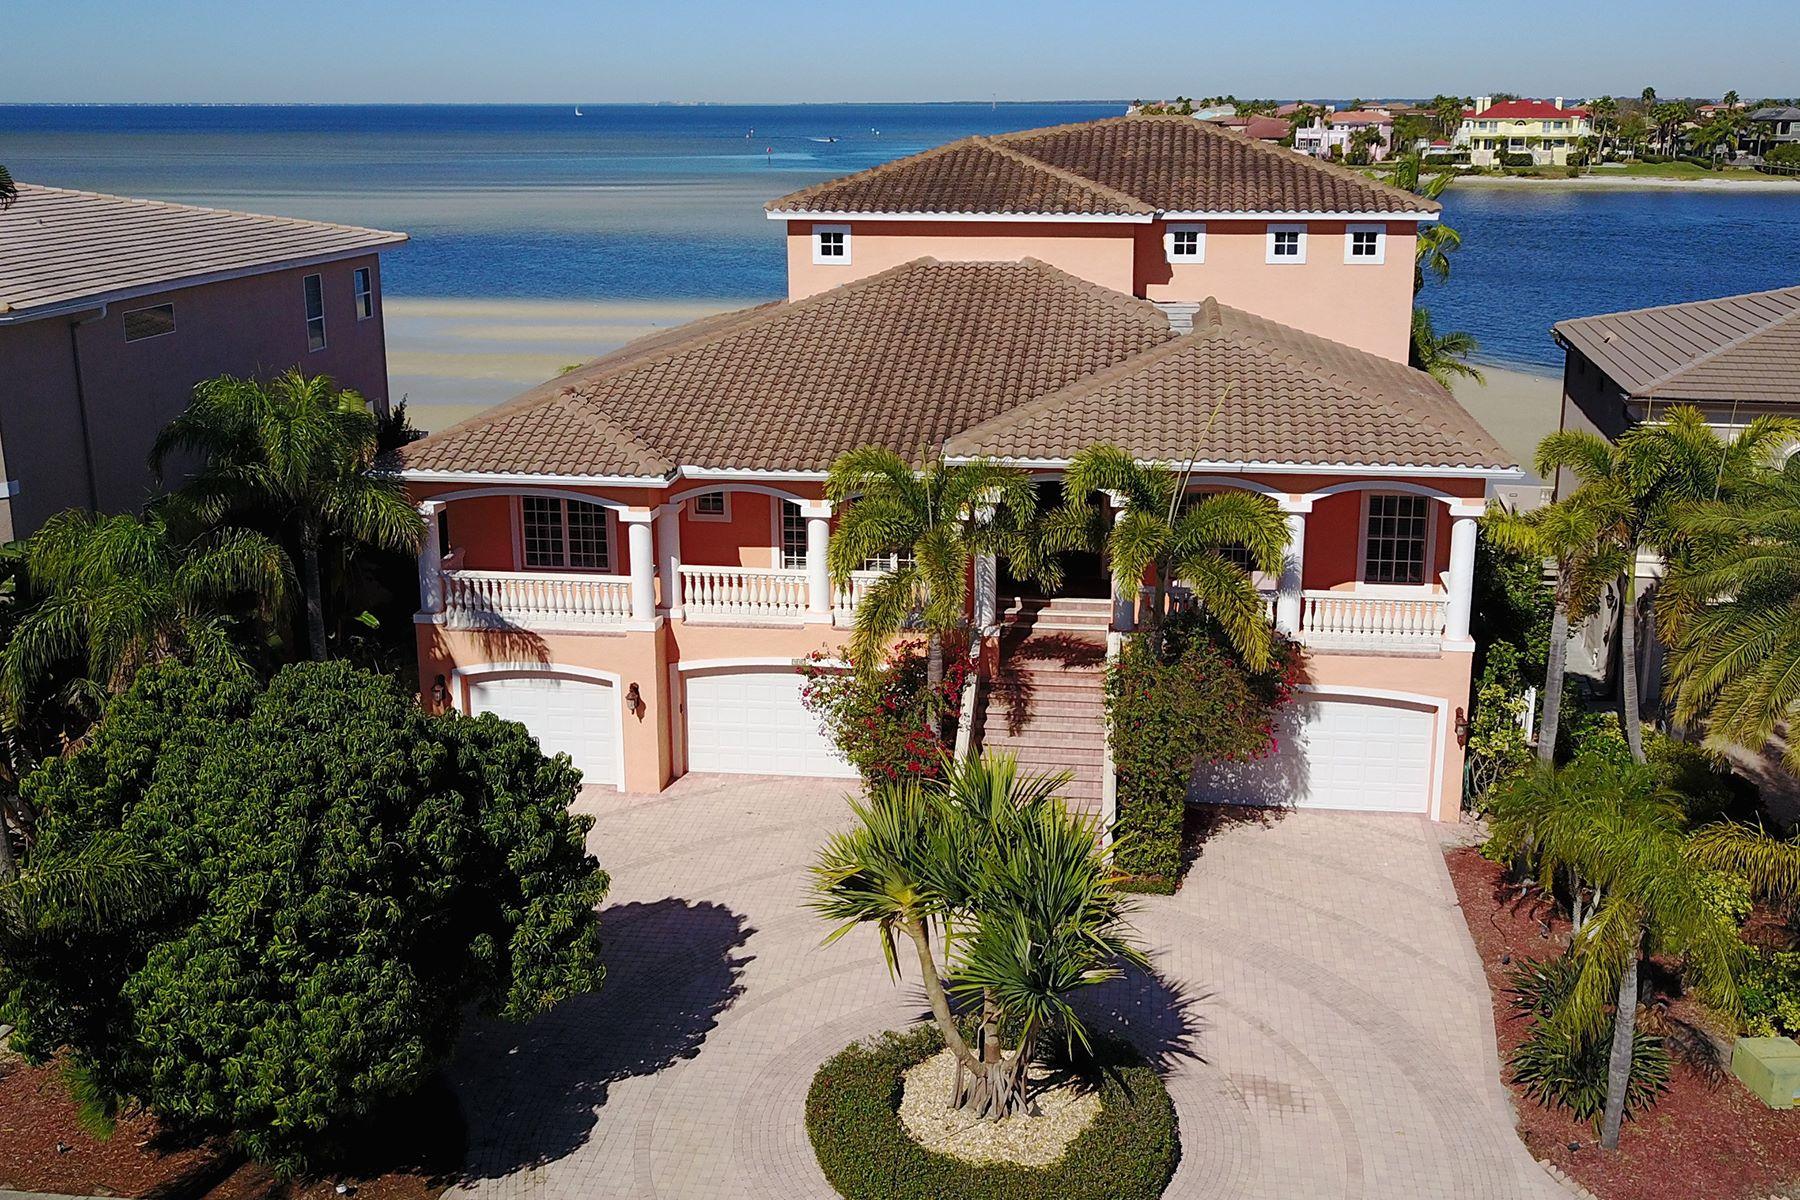 Nhà ở một gia đình vì Bán tại APOLLO BEACH 905 Symphony Beach Ln Apollo Beach, Florida, 33572 Hoa Kỳ